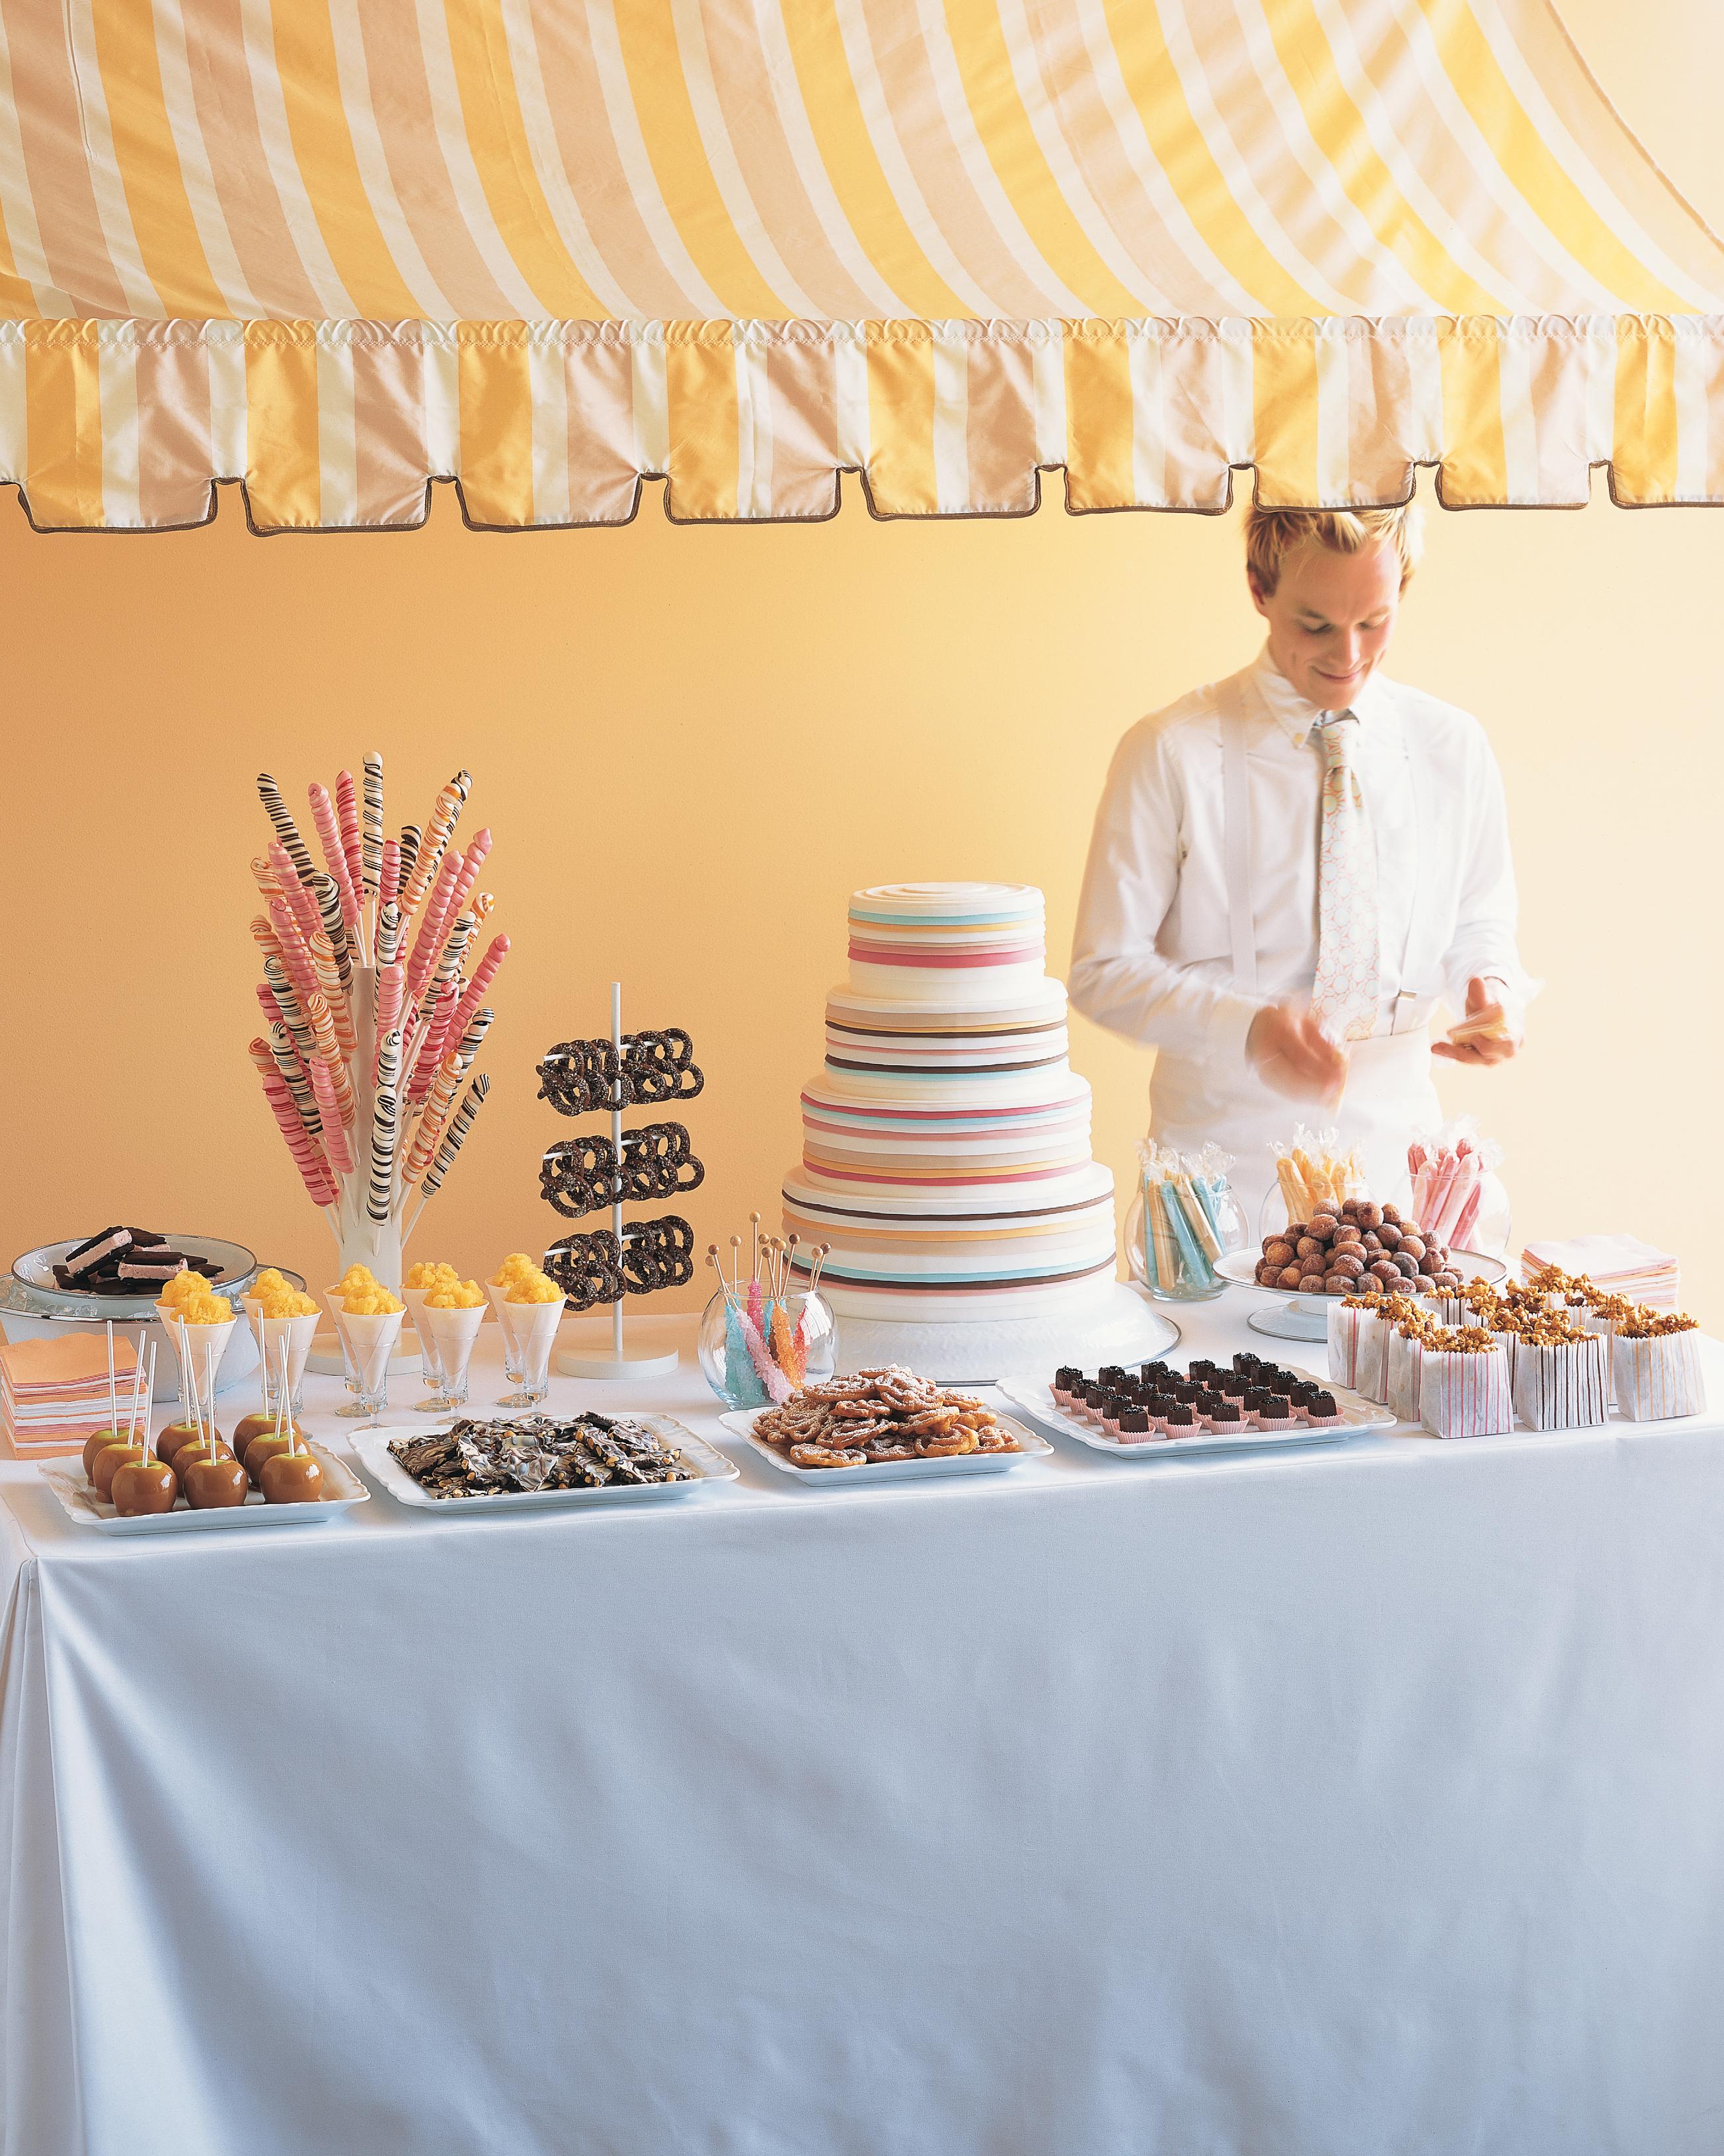 snack-station-carnival-stand-dessert-buffet-w04-0515.jpg